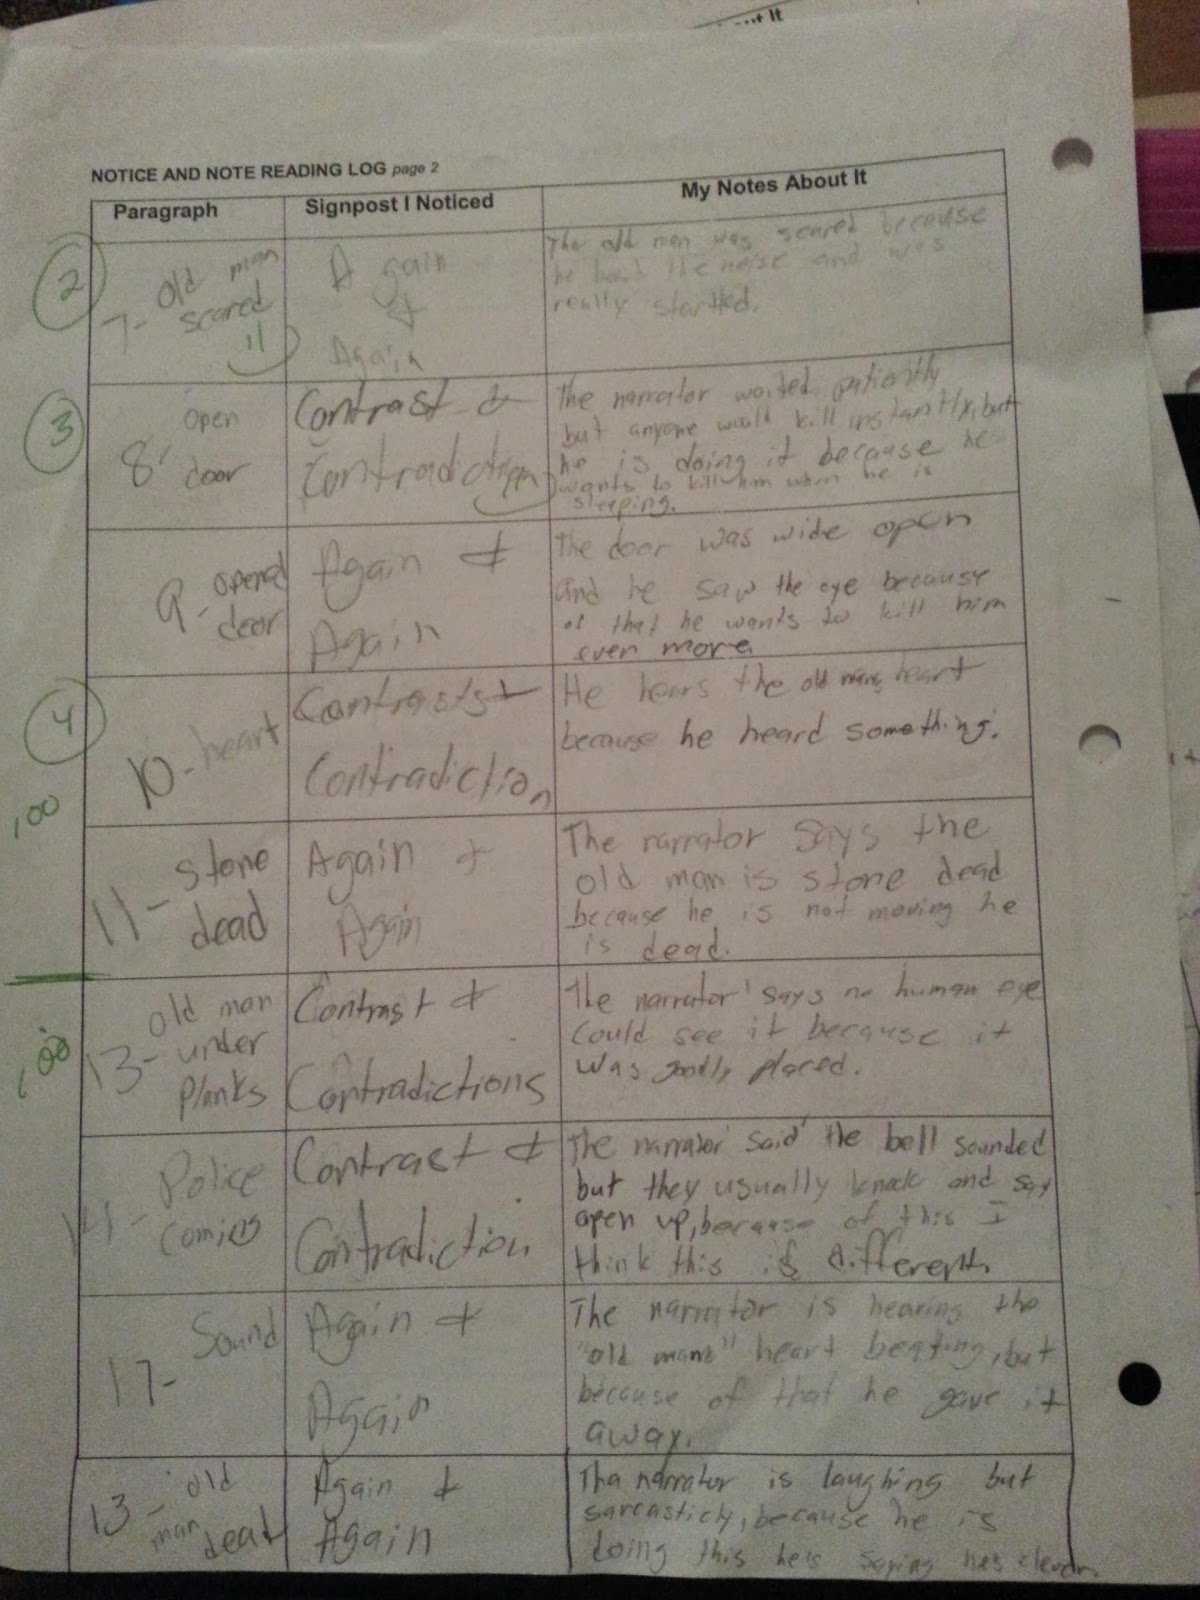 tell tale heart analysis essay